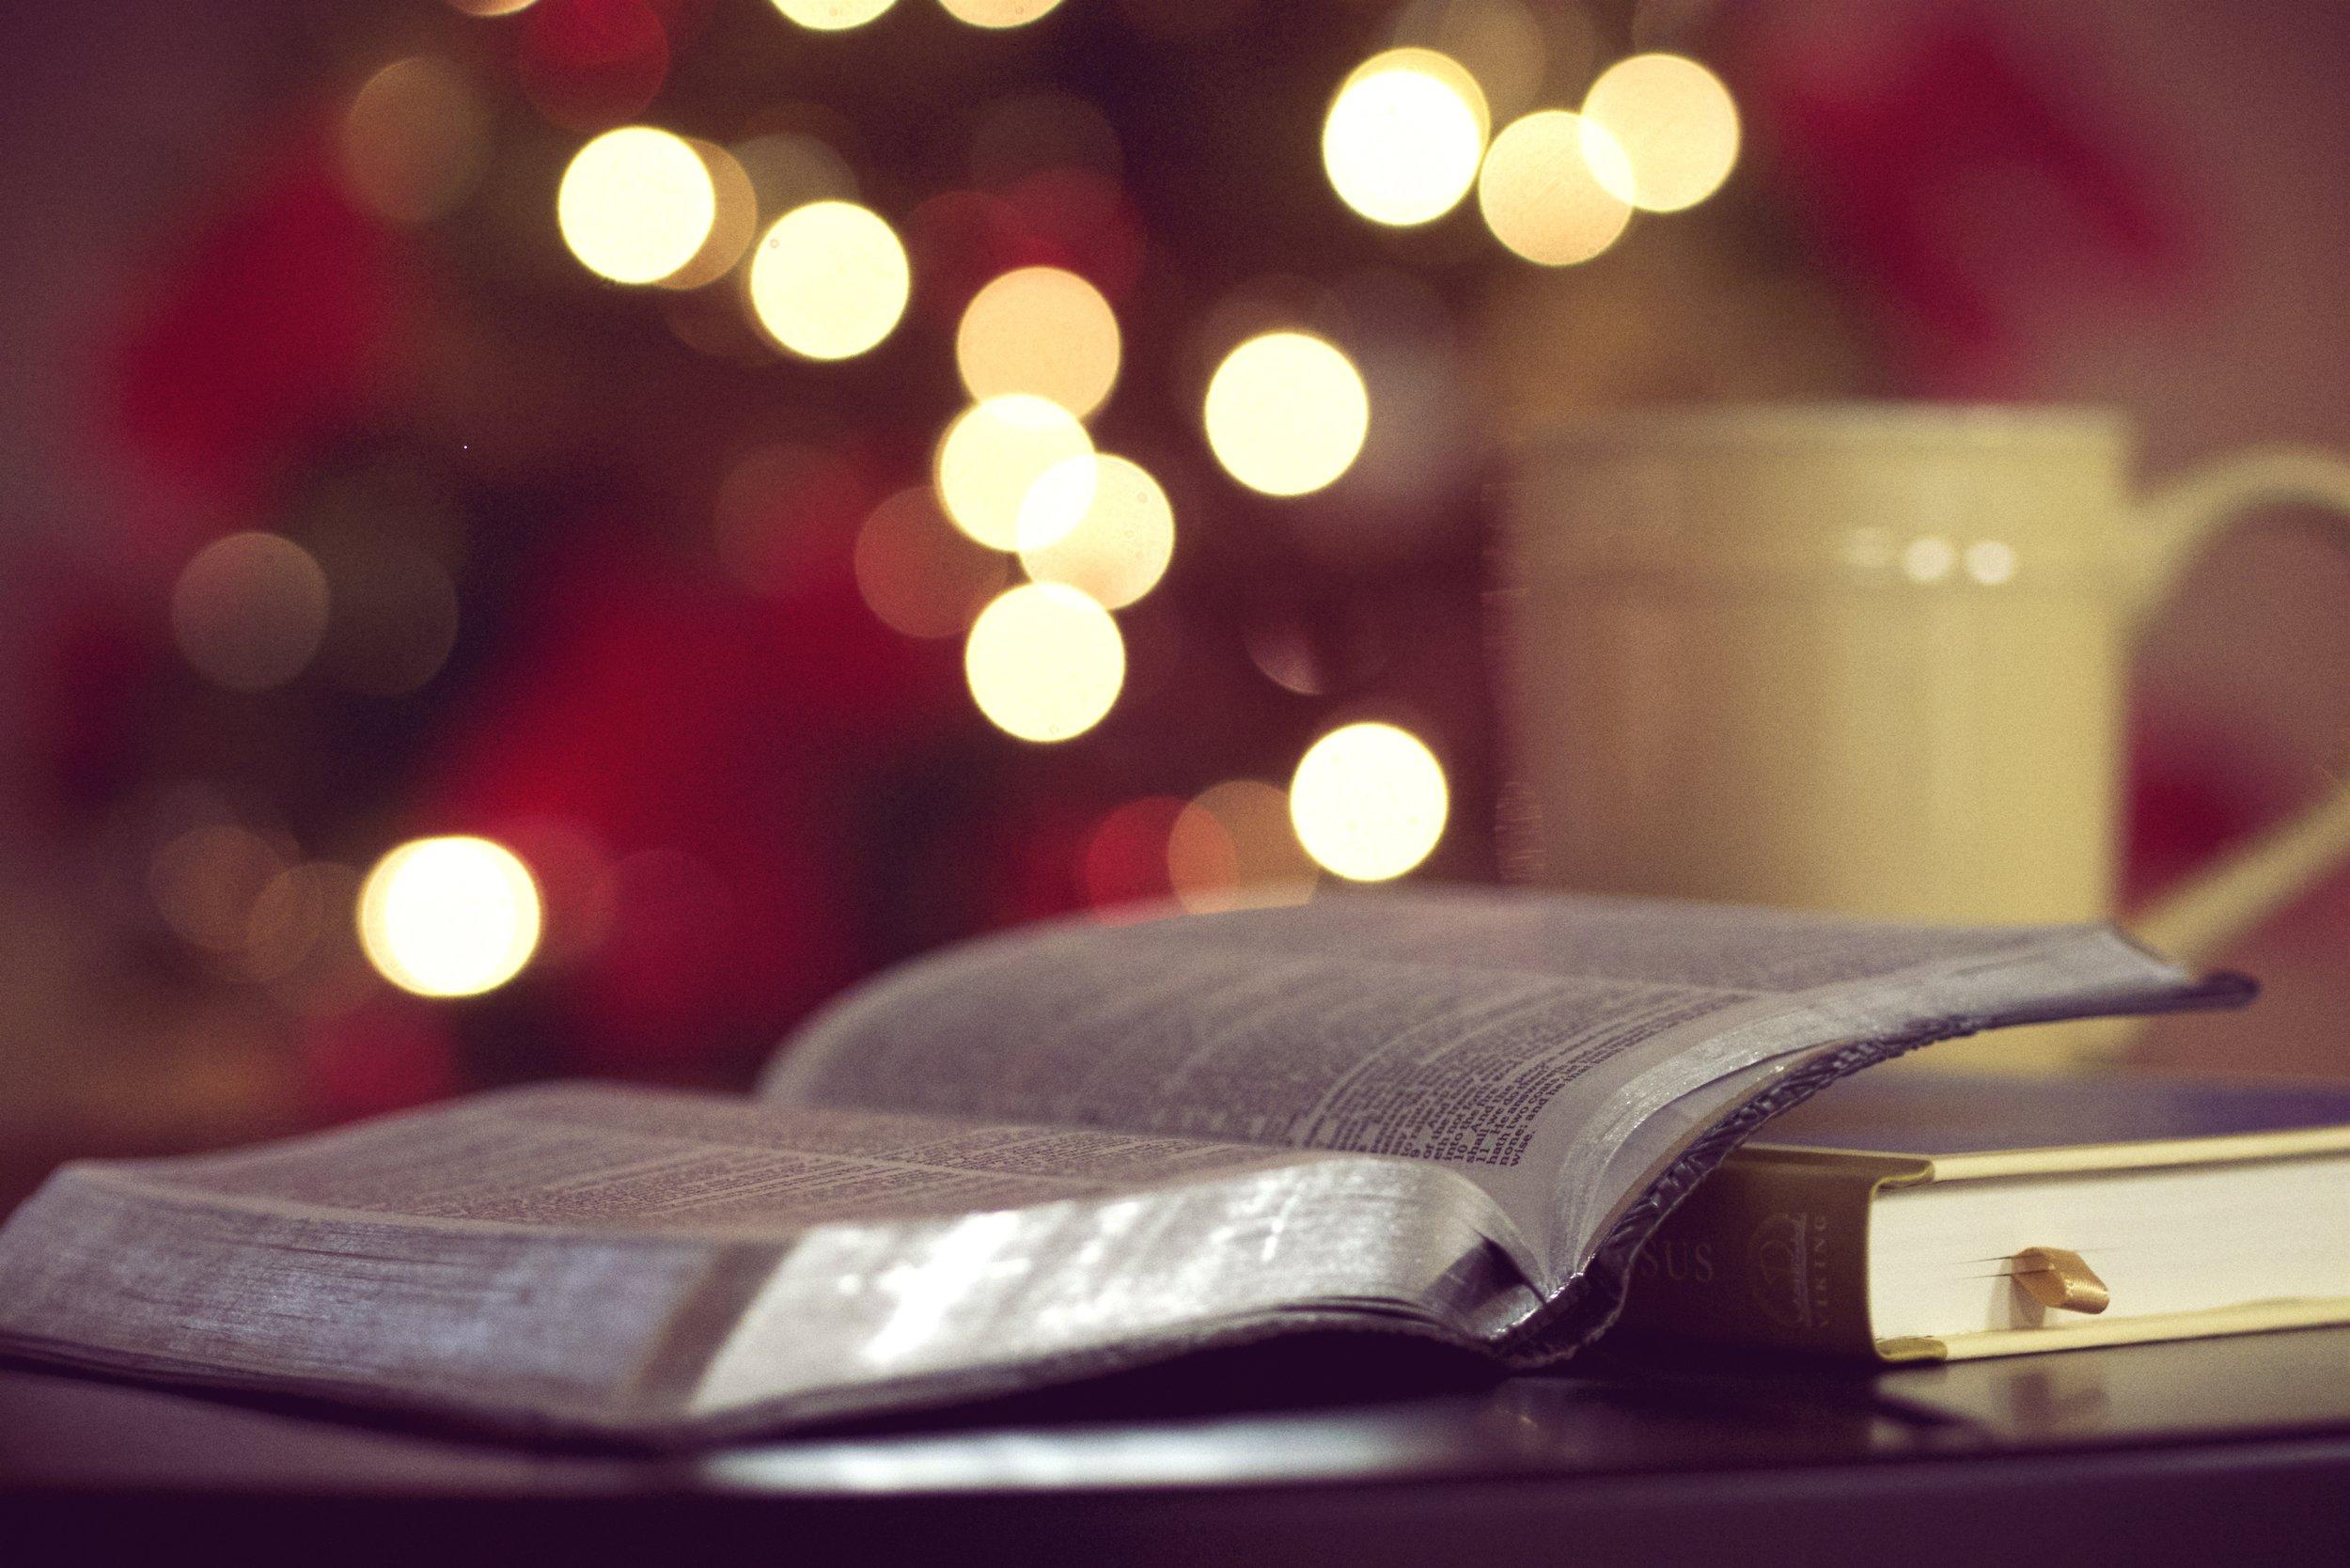 making-room-for-Christmas-life-coach-blog.jpg